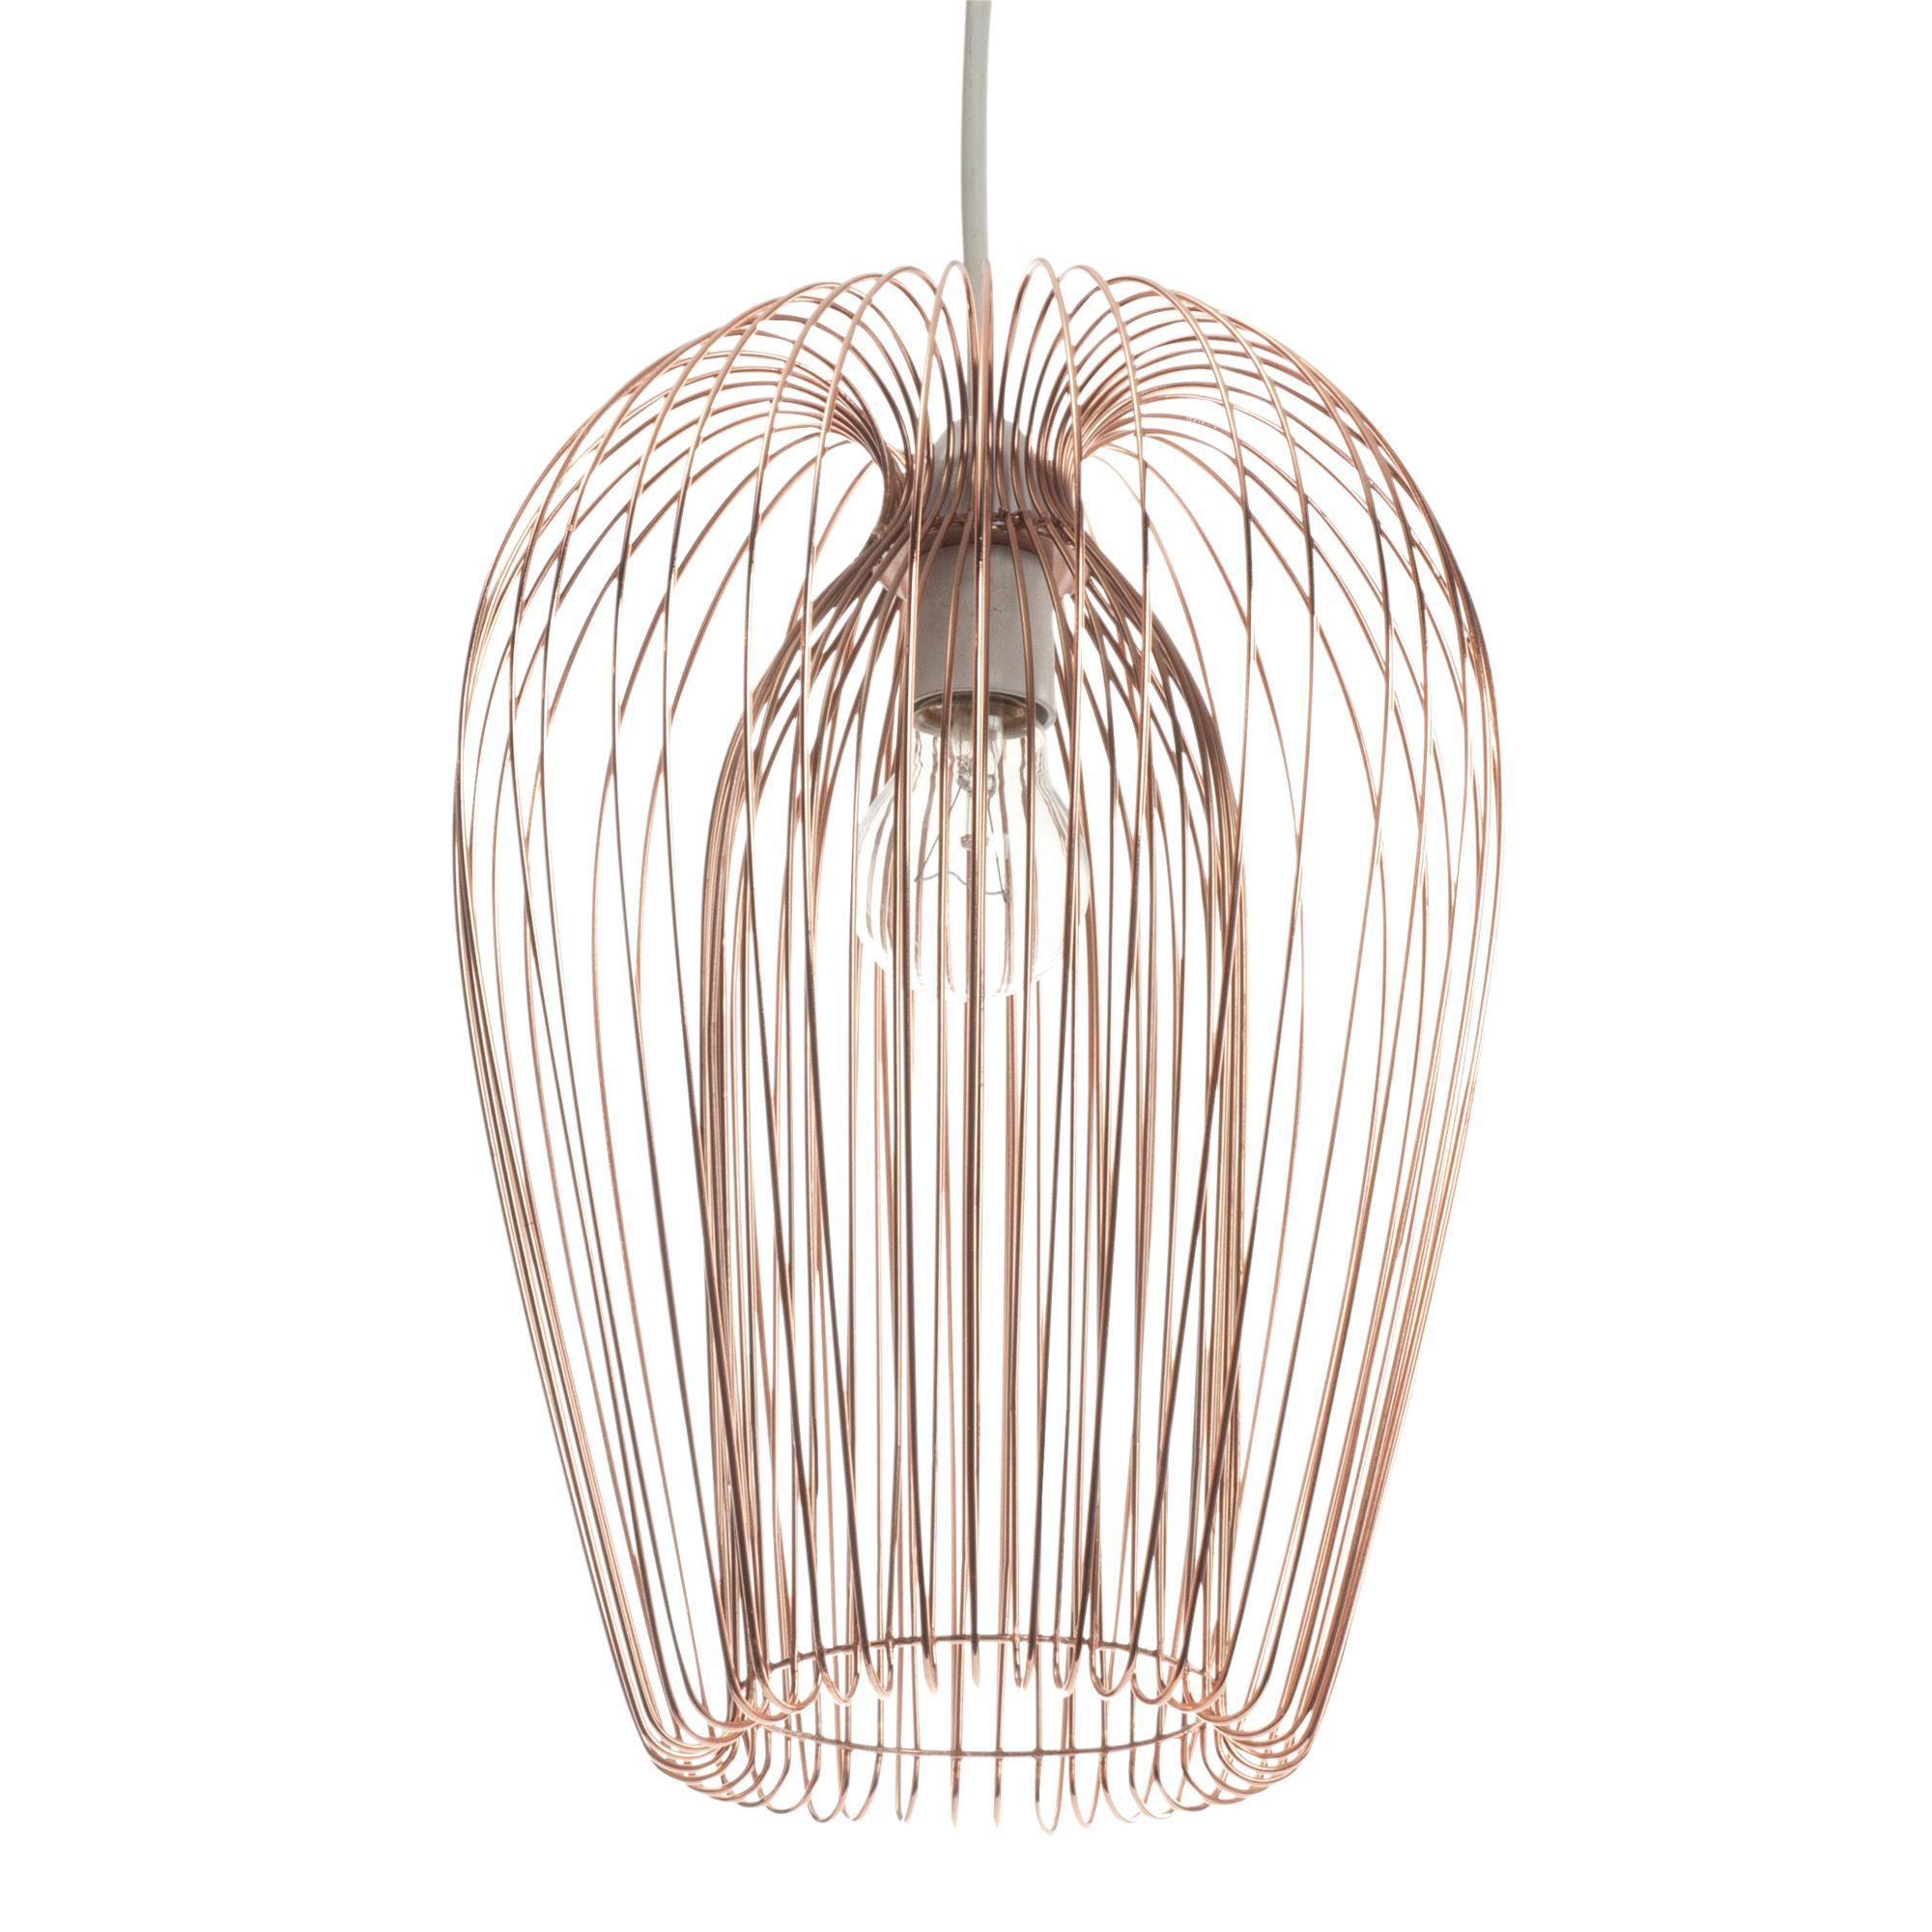 Related image 2017 lighting inspiration pinterest copper wire copper bathtubcopper wire lightsart nouveau interiorlight shadeskitchen diningroom decorbathtubslandingbedroom ideas arubaitofo Images